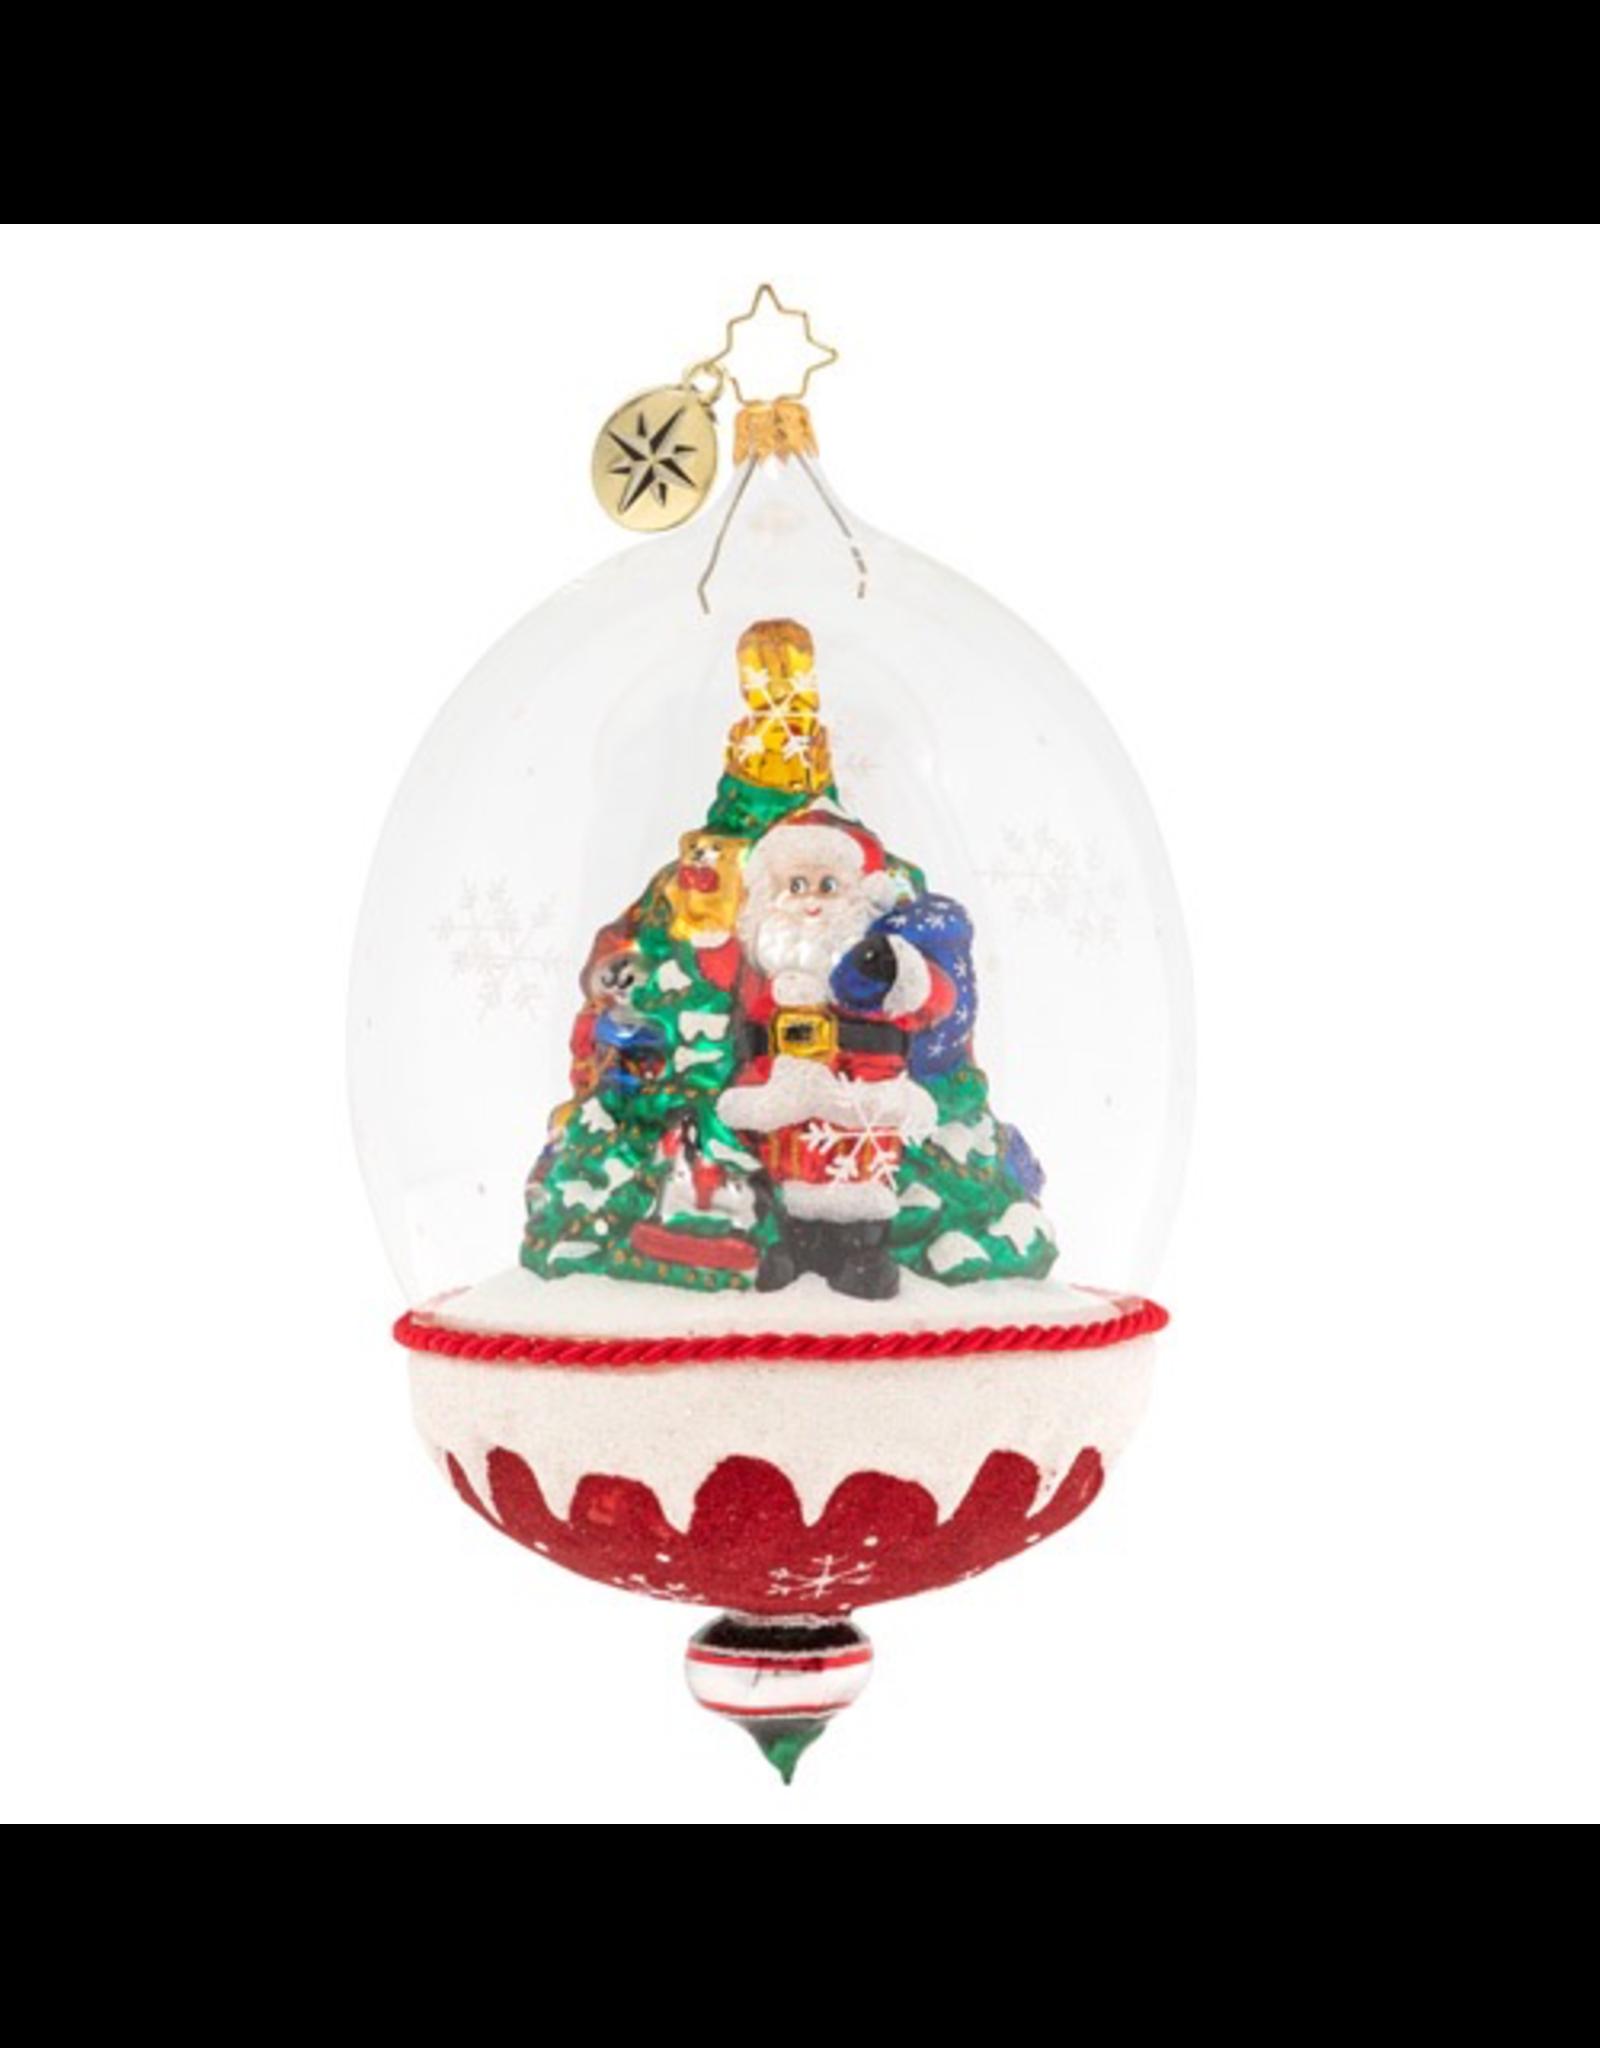 Christopher Radko Snowdome of Toys Christmas Ornament